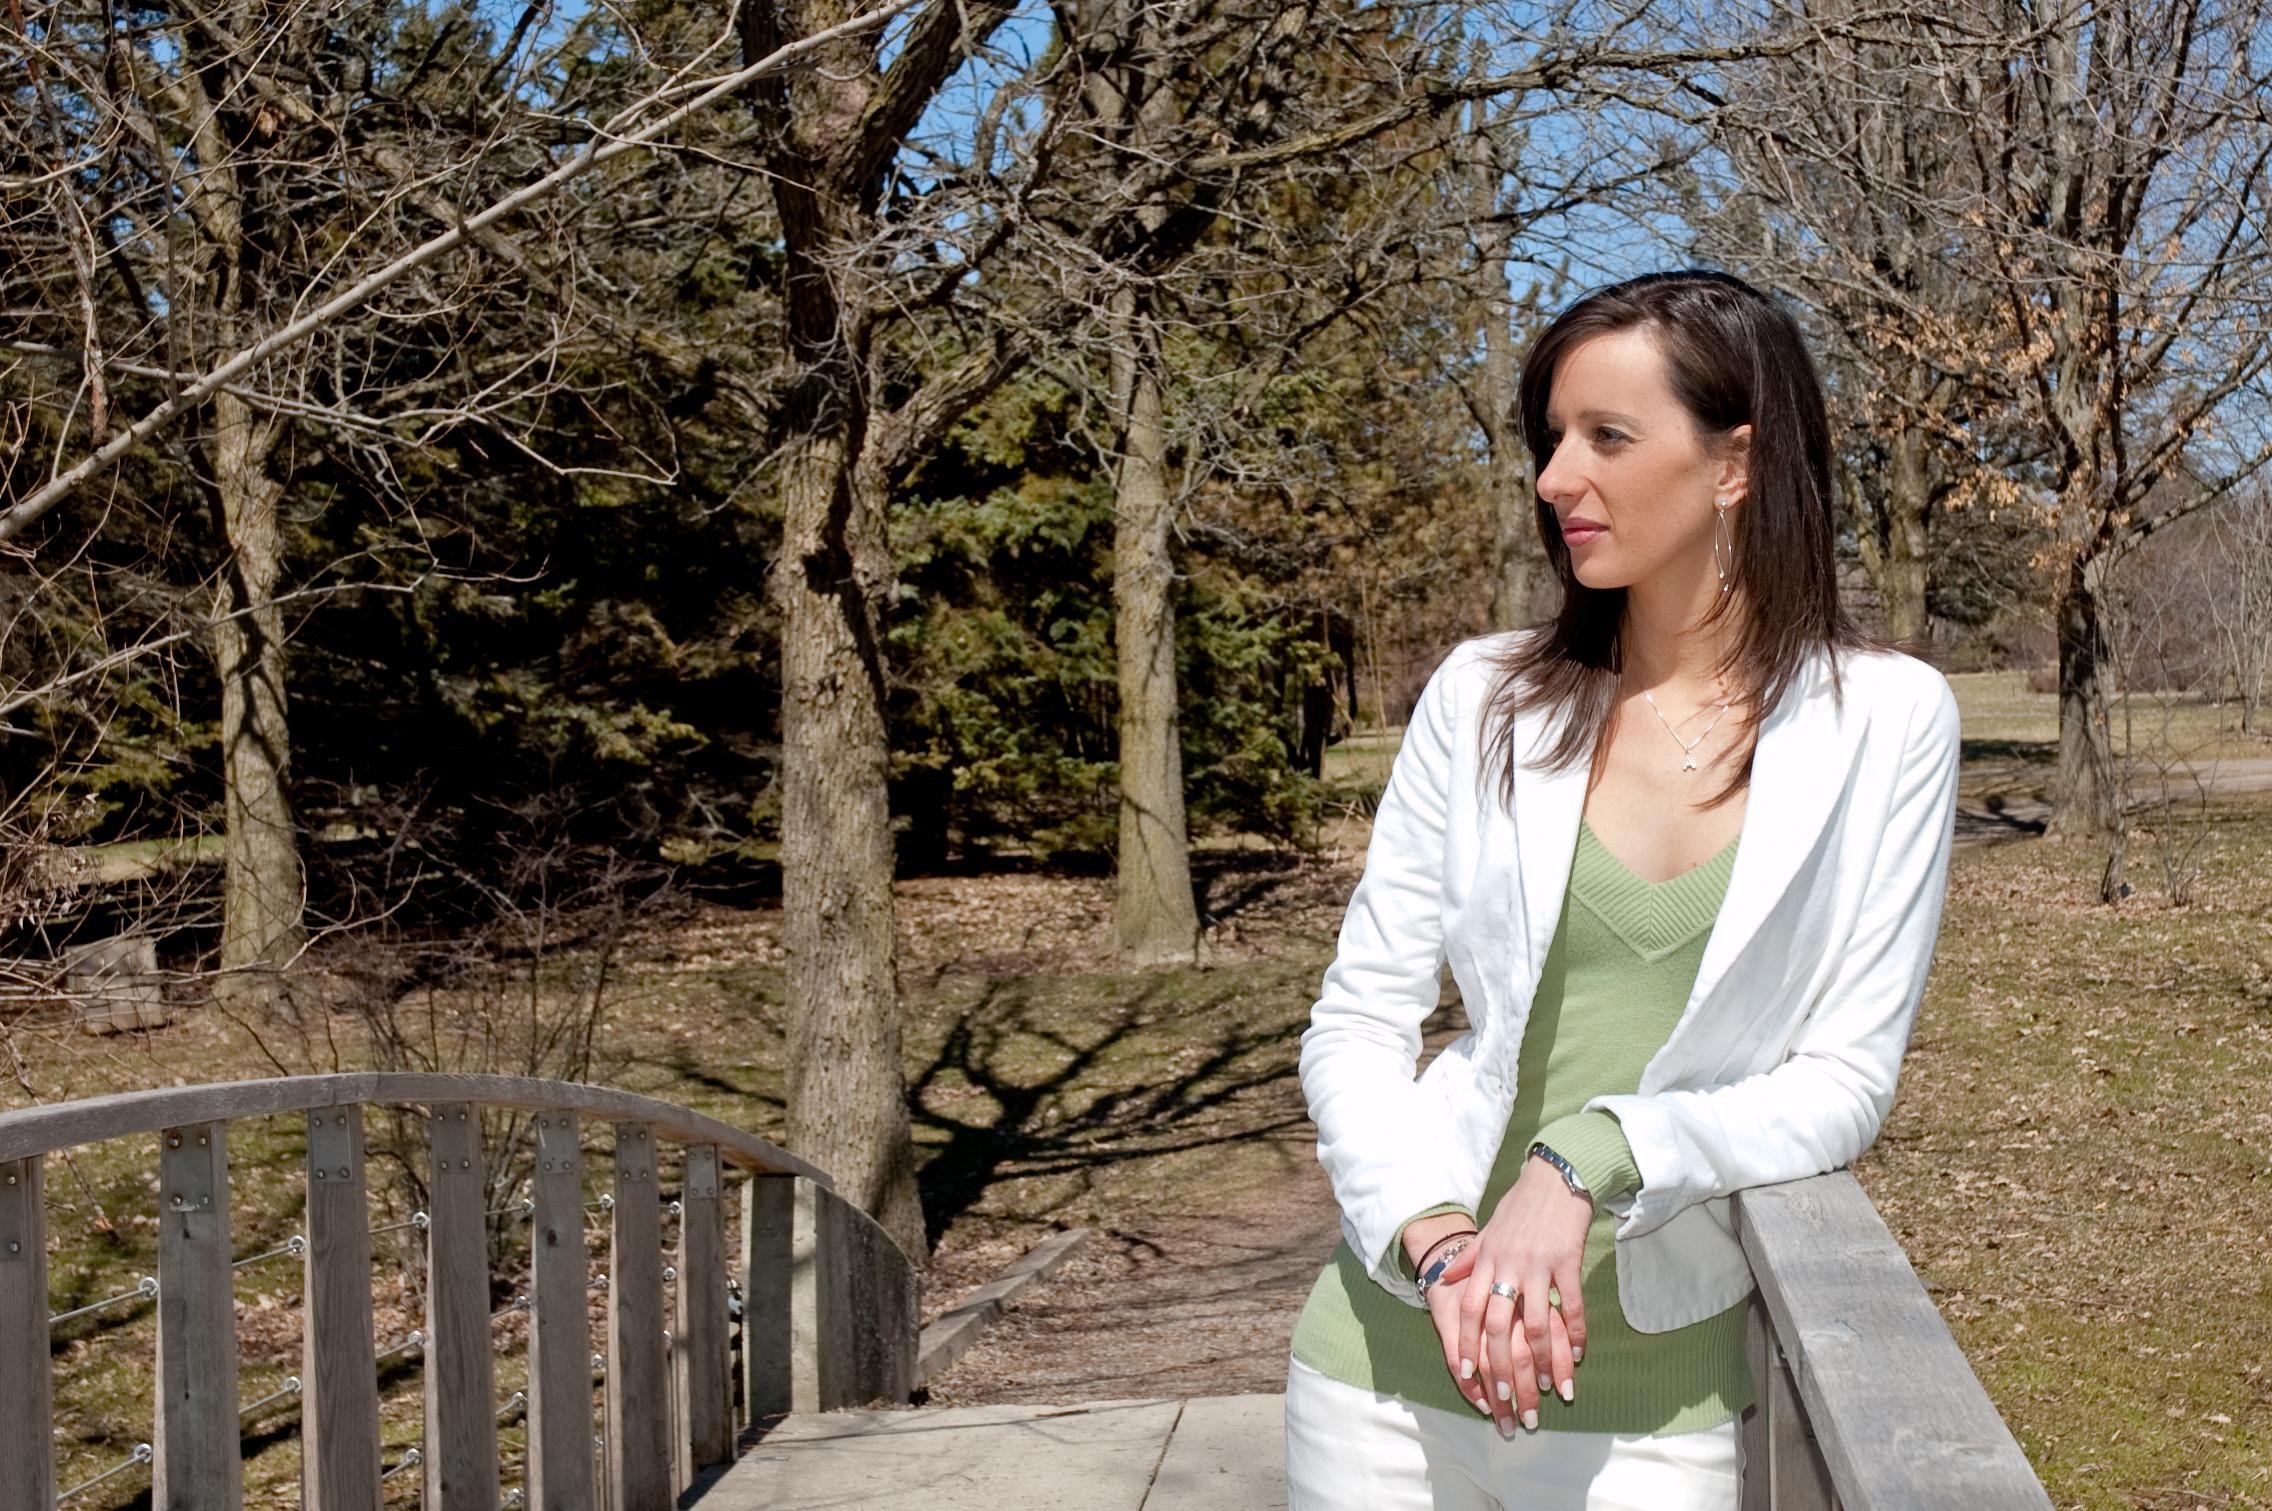 AmandaFerguson_20060408_2341.jpg